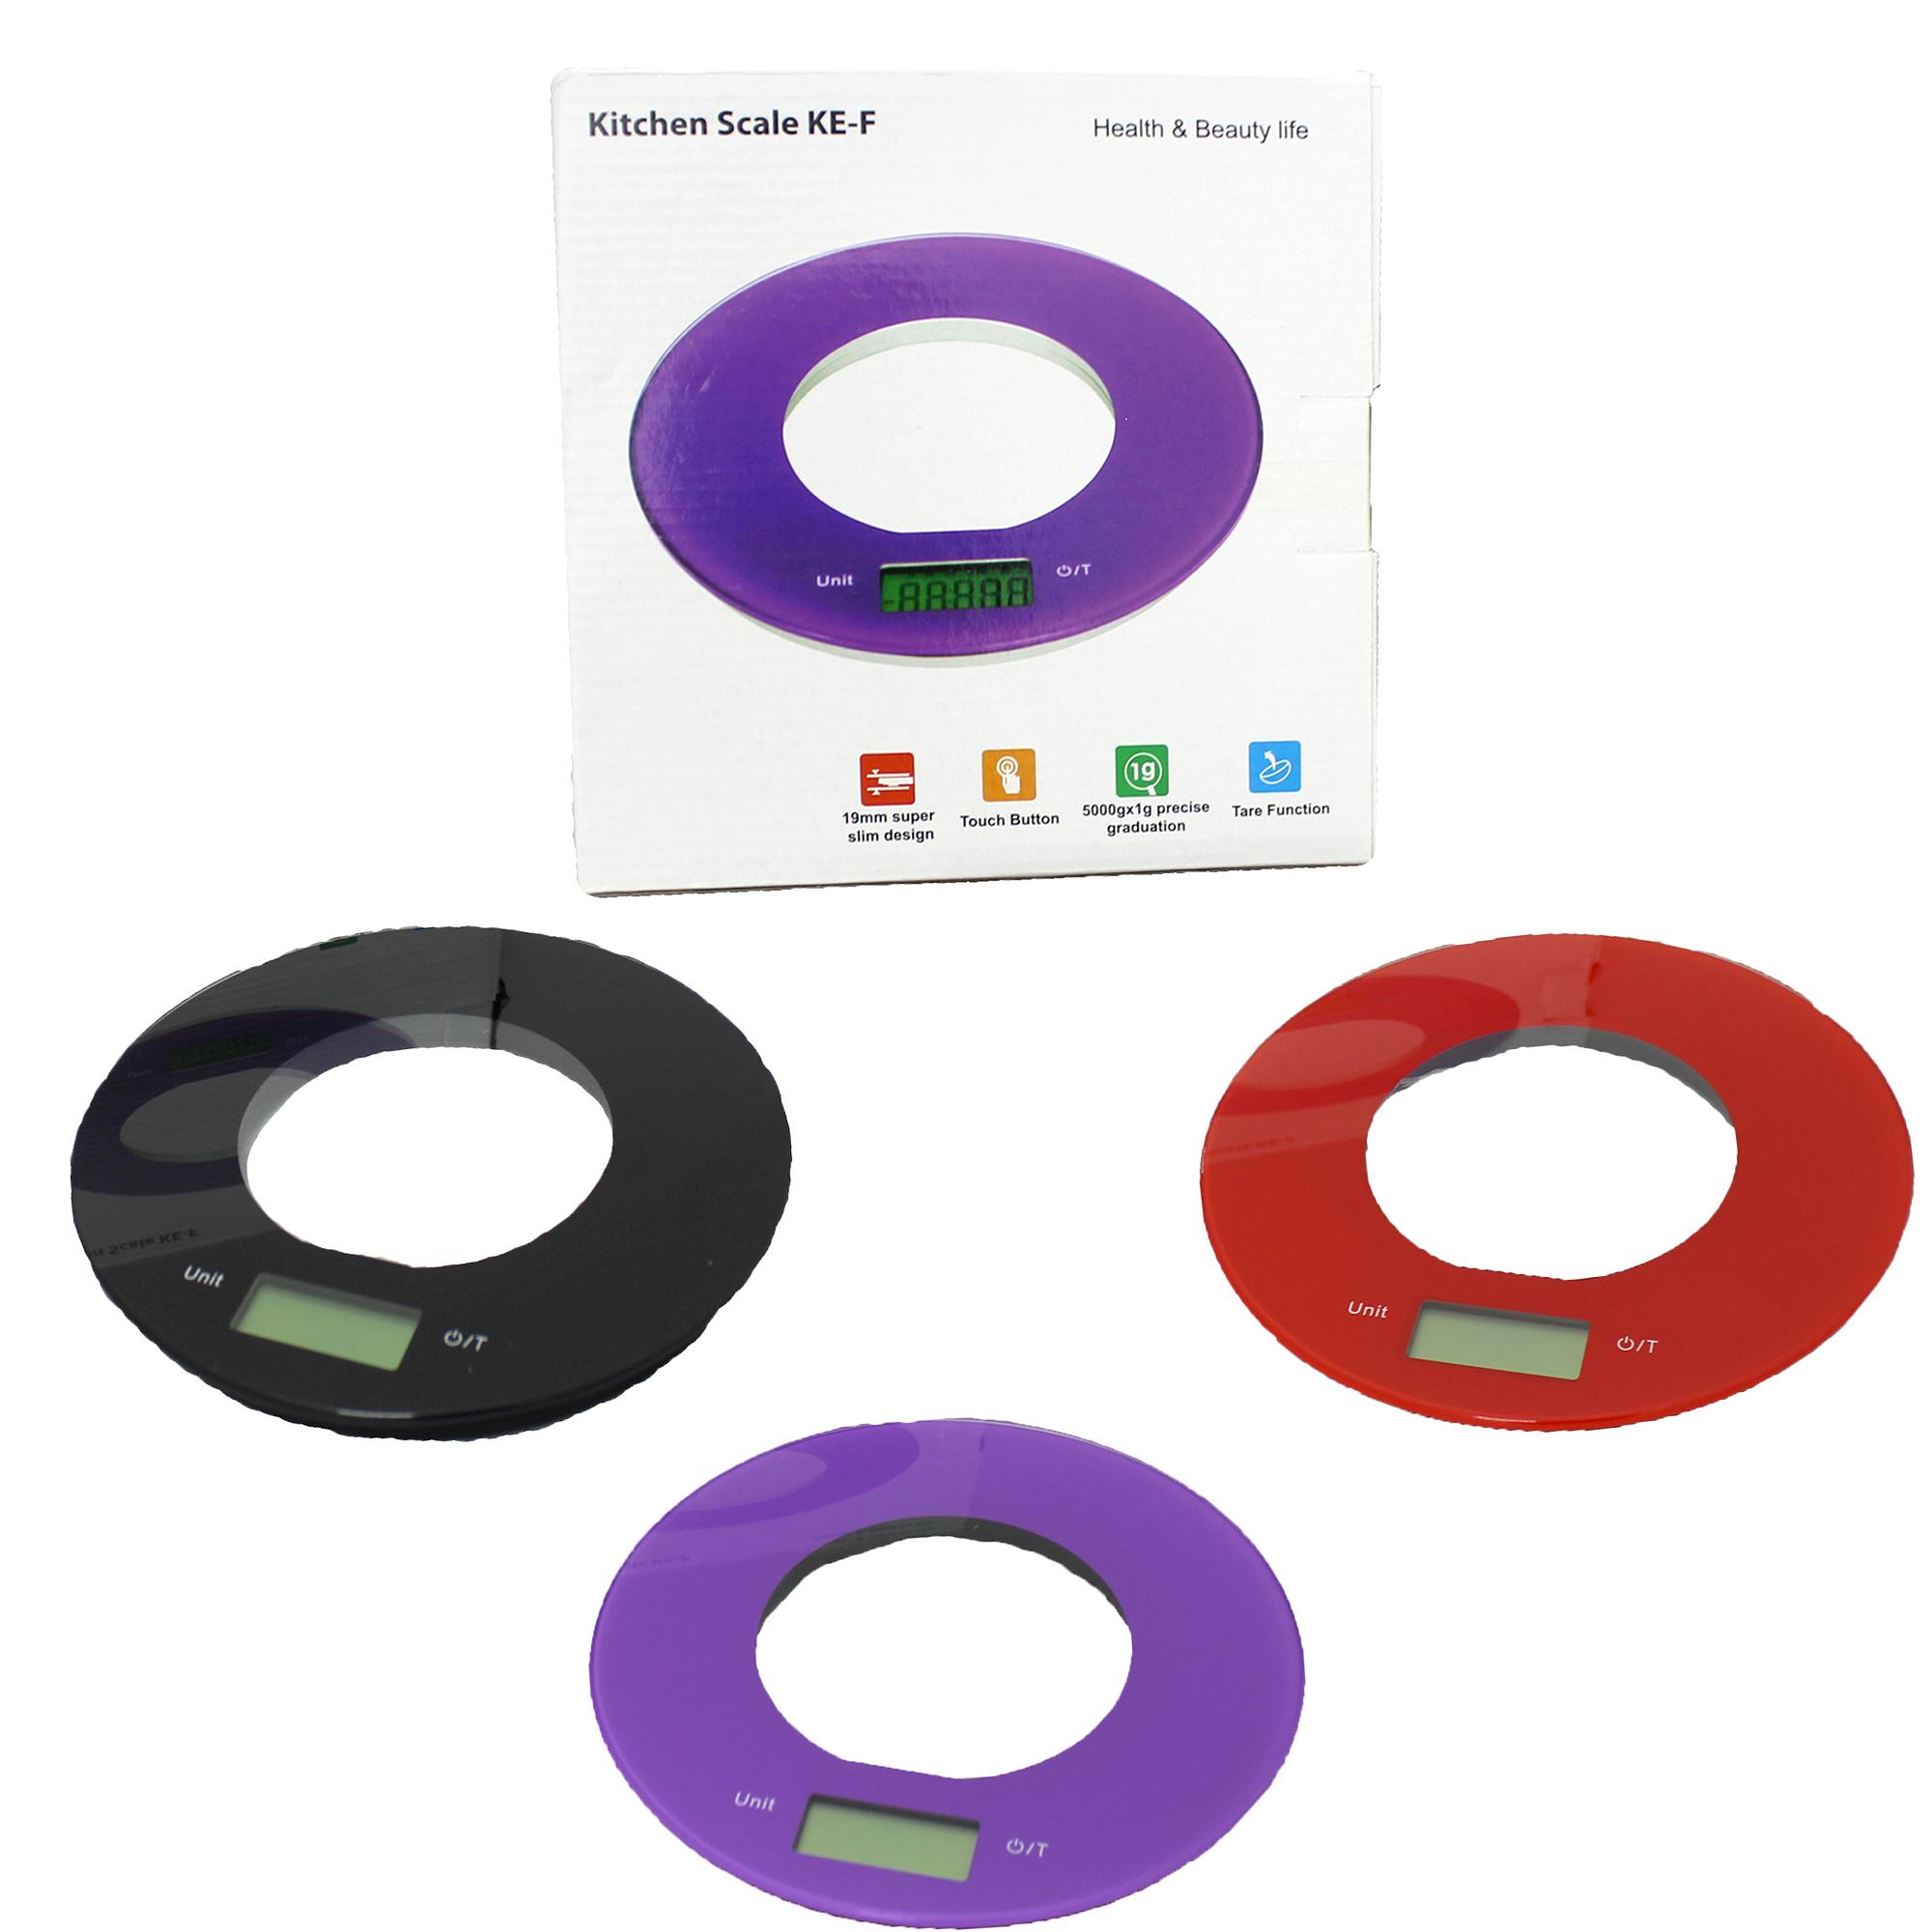 AS - Электронный шкаф для взвешивания в кухне (KE-F) (до 5 кг)